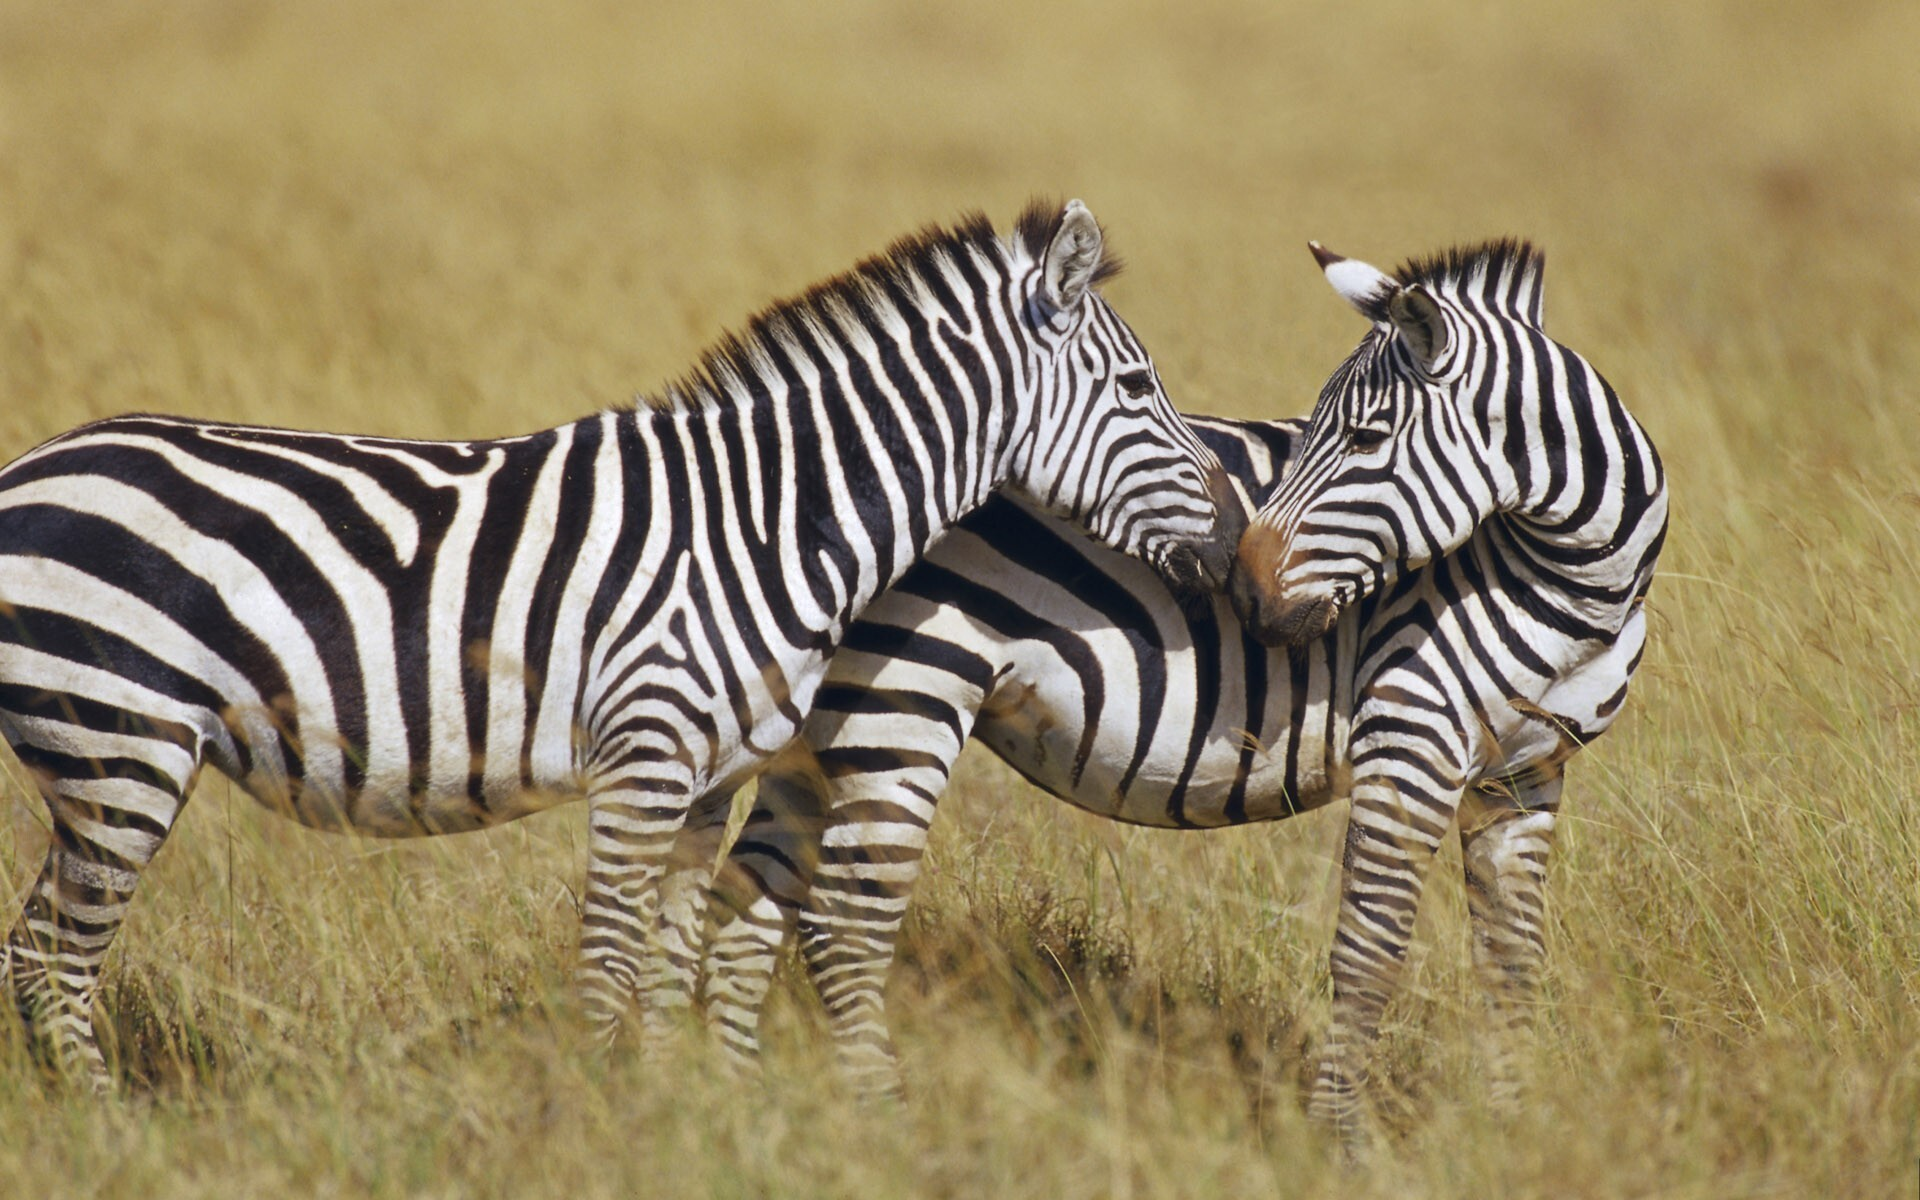 animals wallpapers   free download 1080p hd desktop images wide